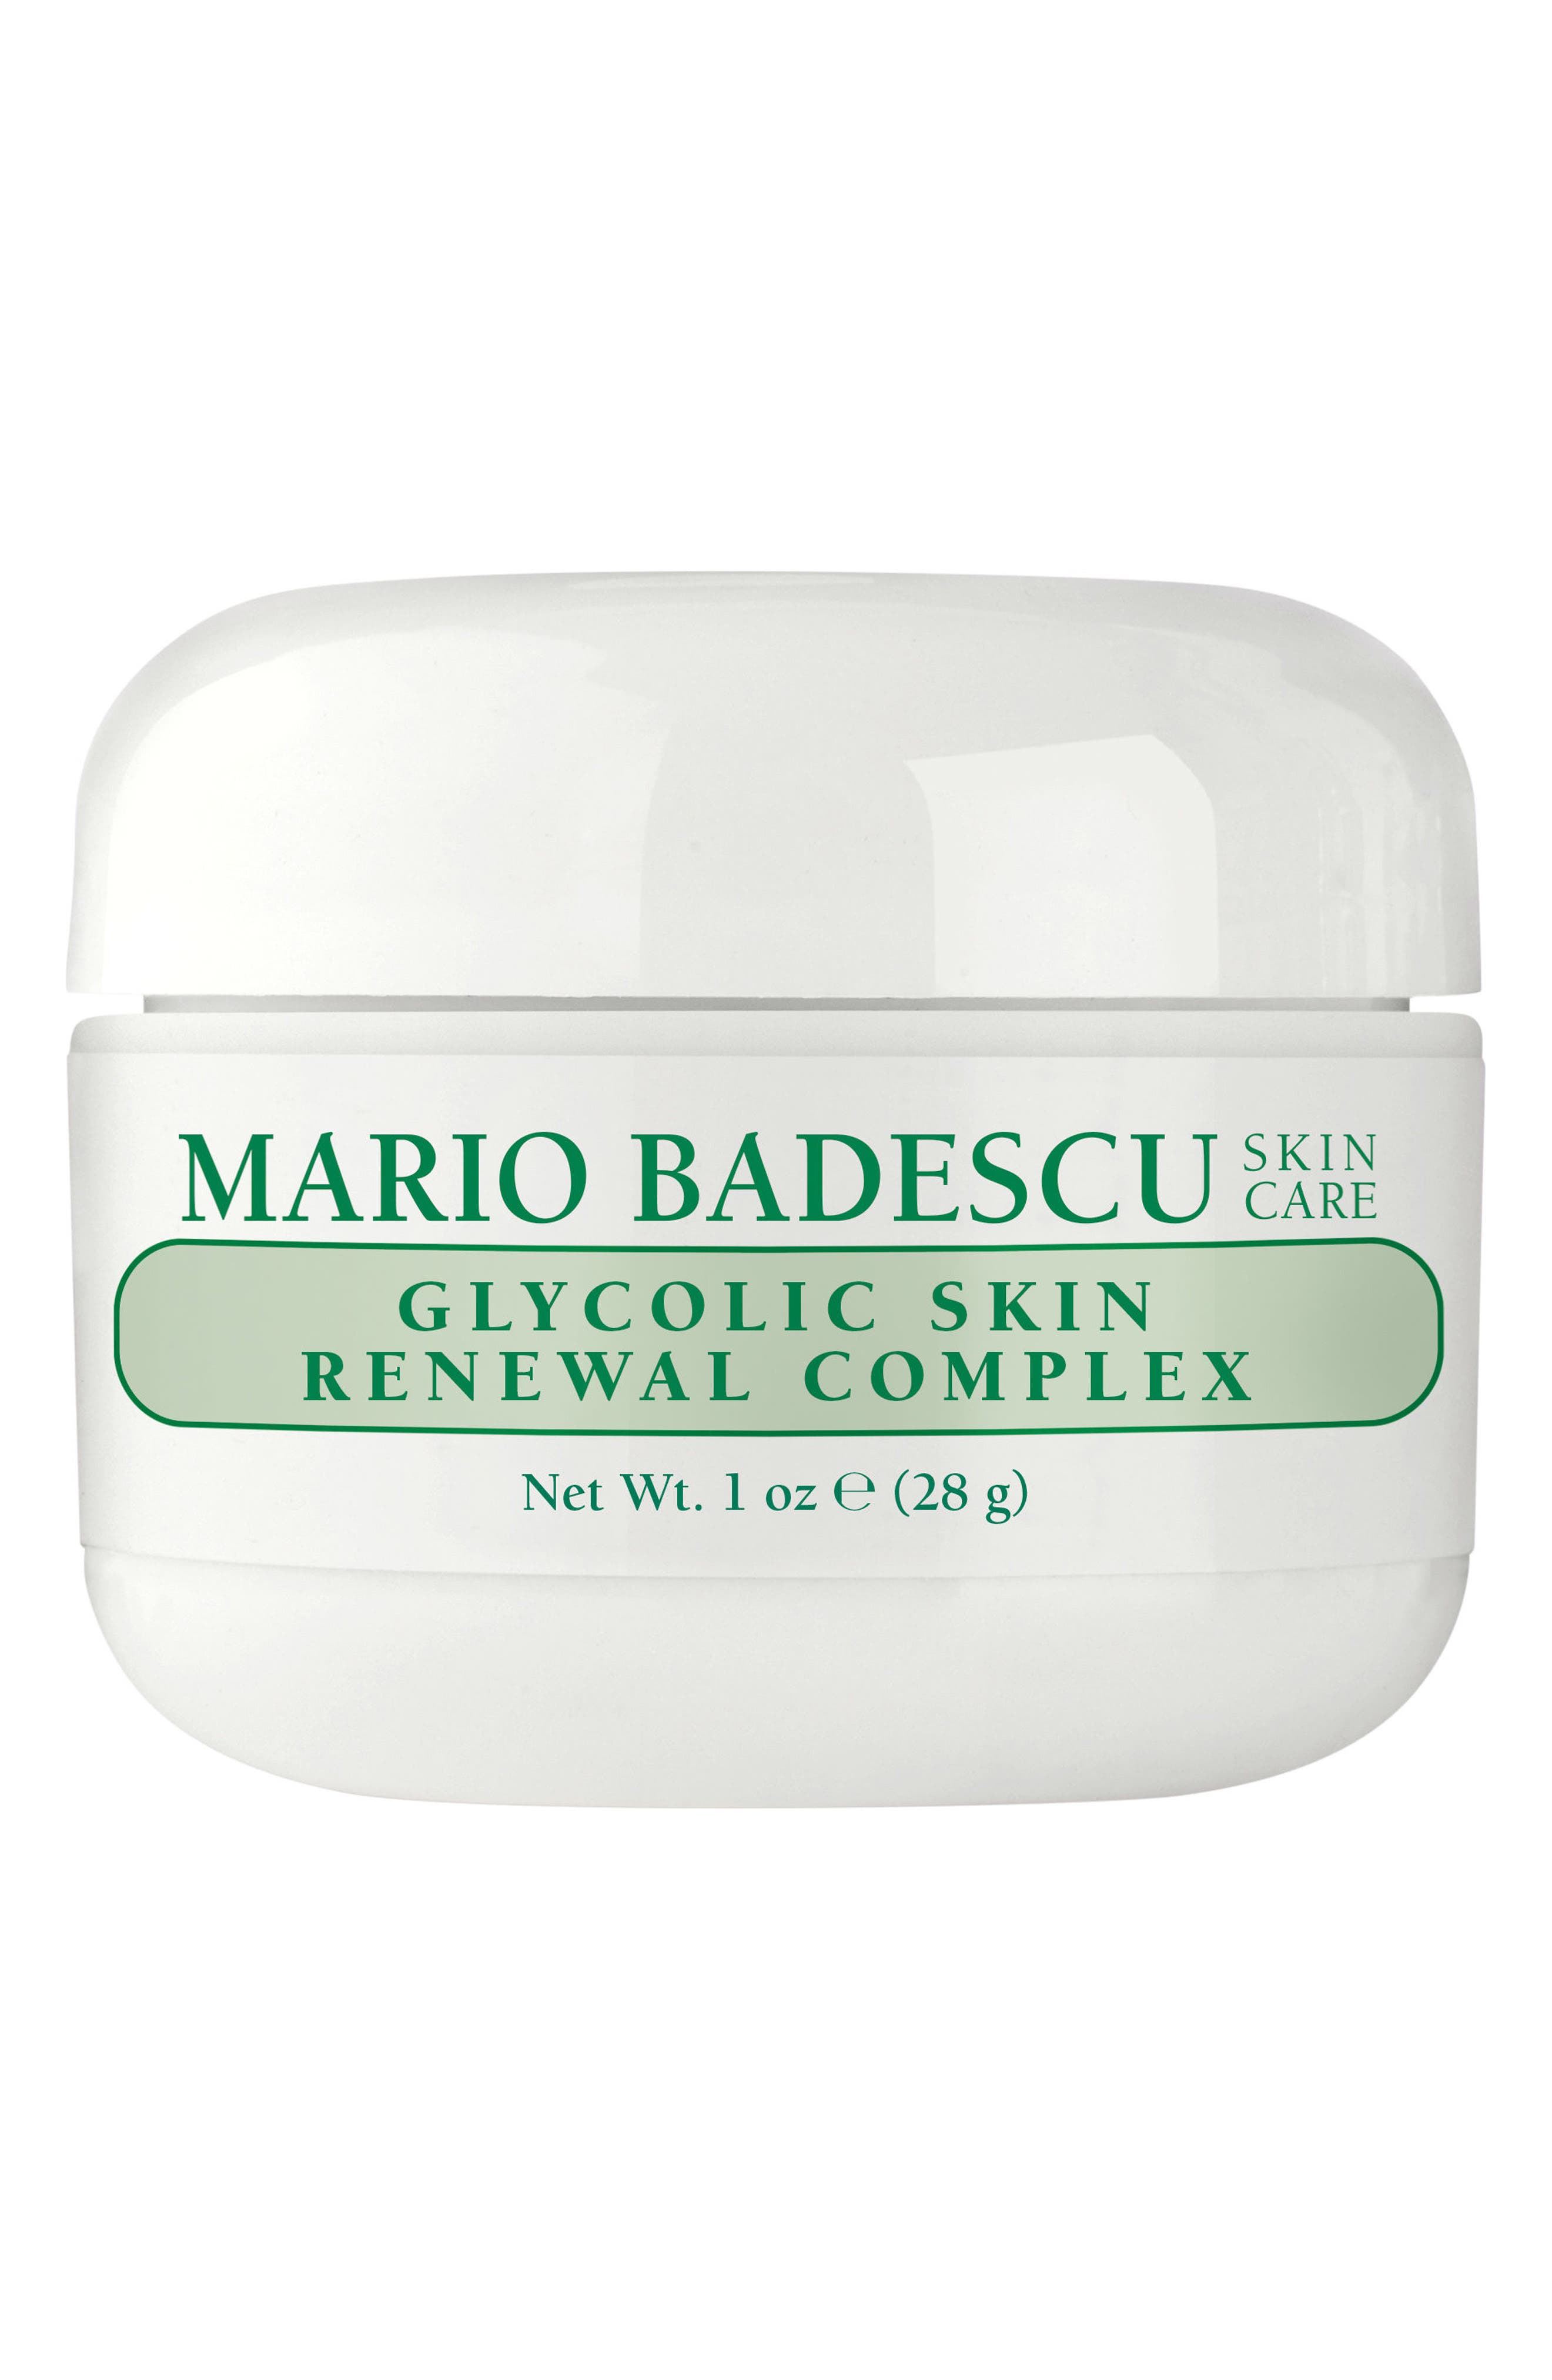 MARIO BADESCU, Glycolic Skin Renewal Complex Cream, Main thumbnail 1, color, NO COLOR